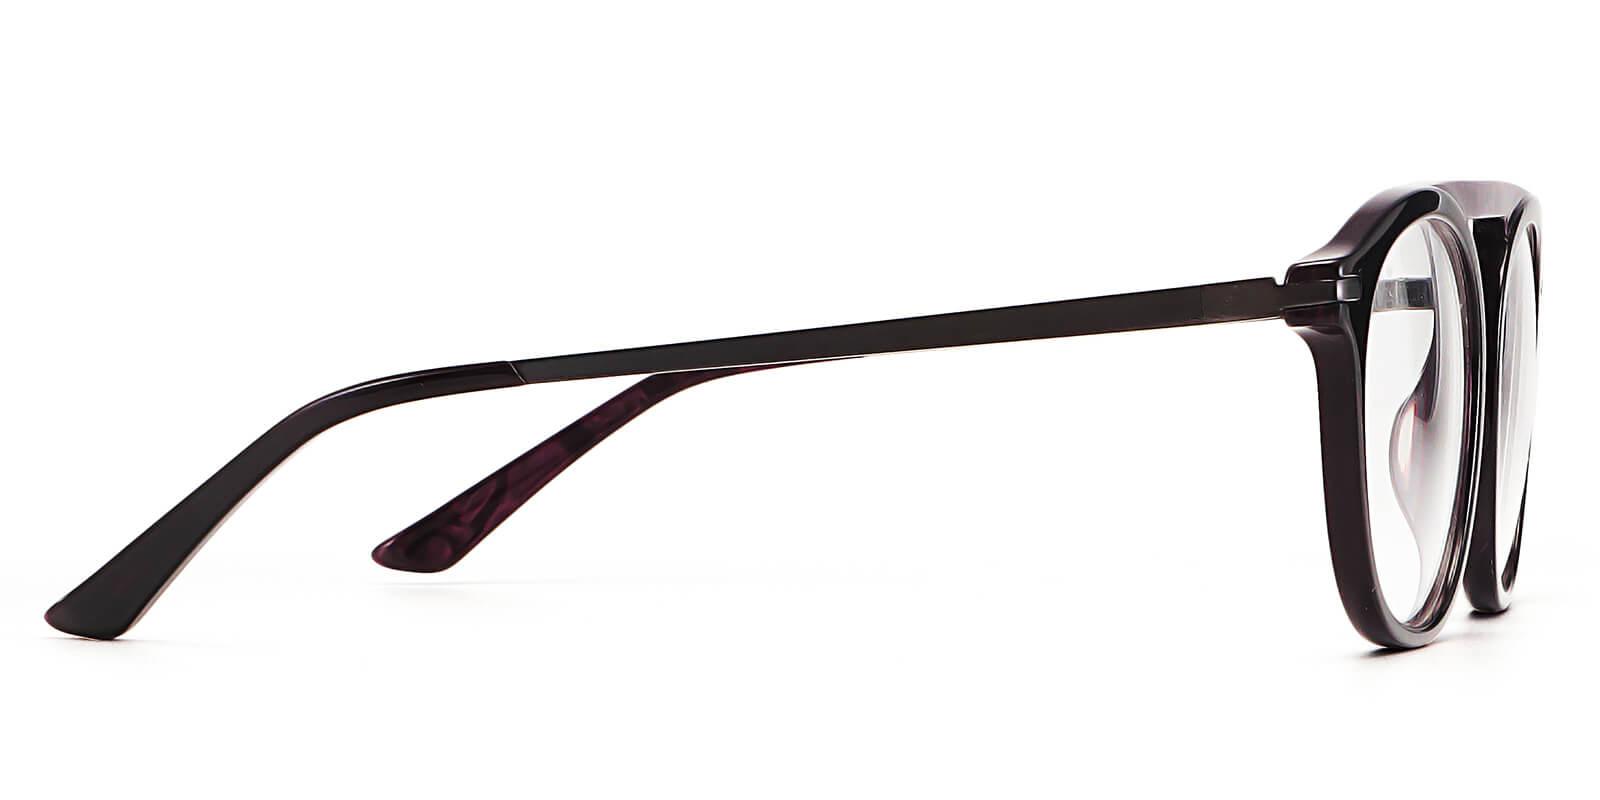 Ocean-Aviator classis glasses with single bridge layered color design